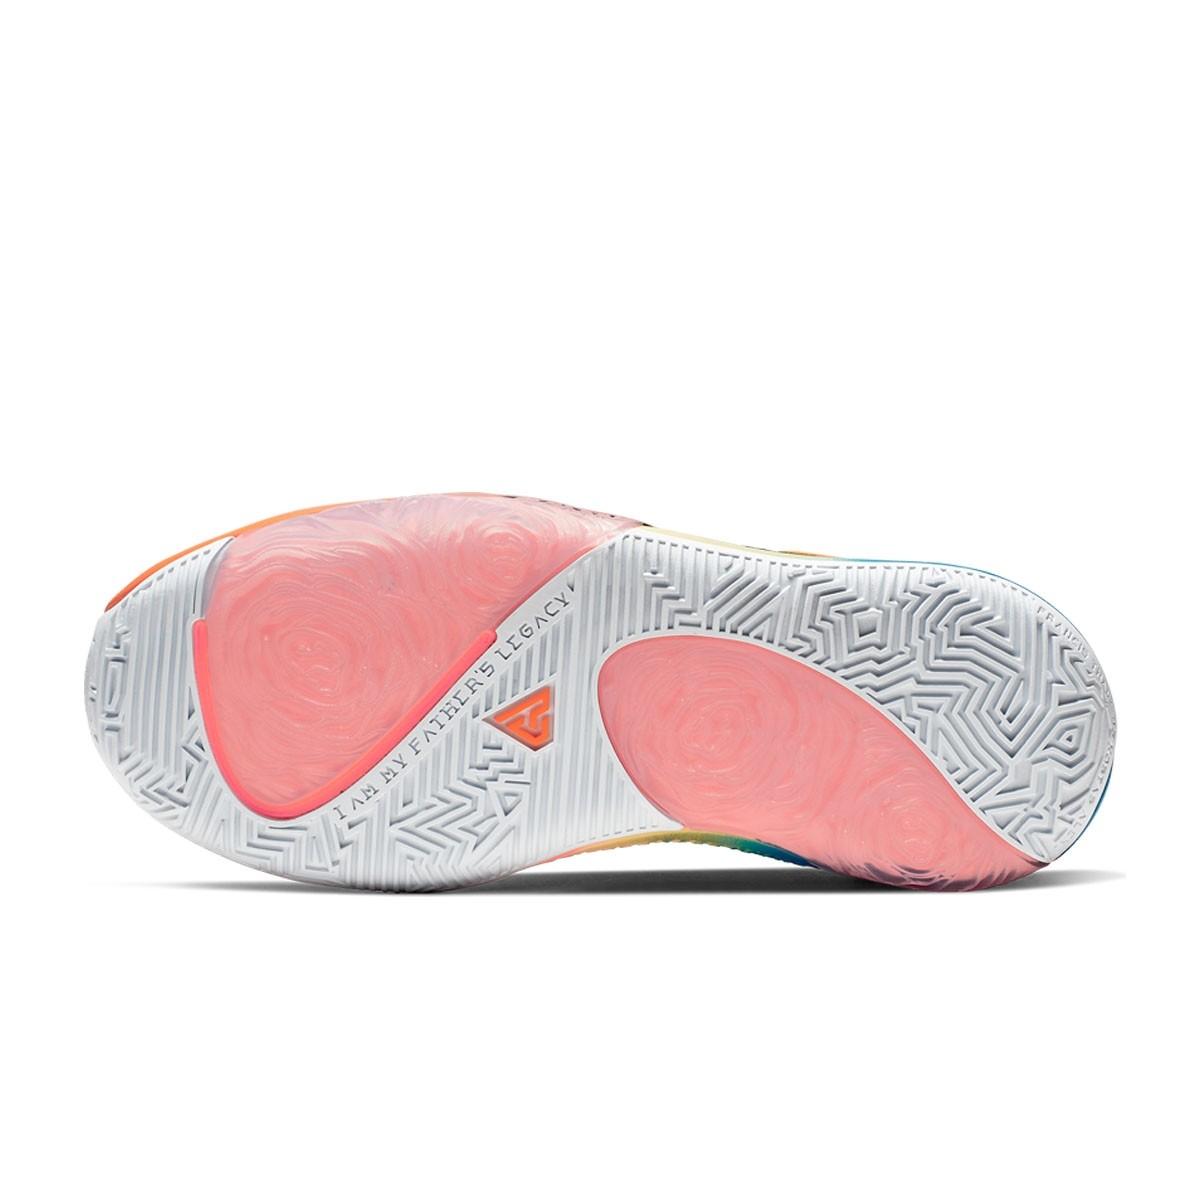 Nike Freak 1 GS 'Antetokounbros' BQ5633-800